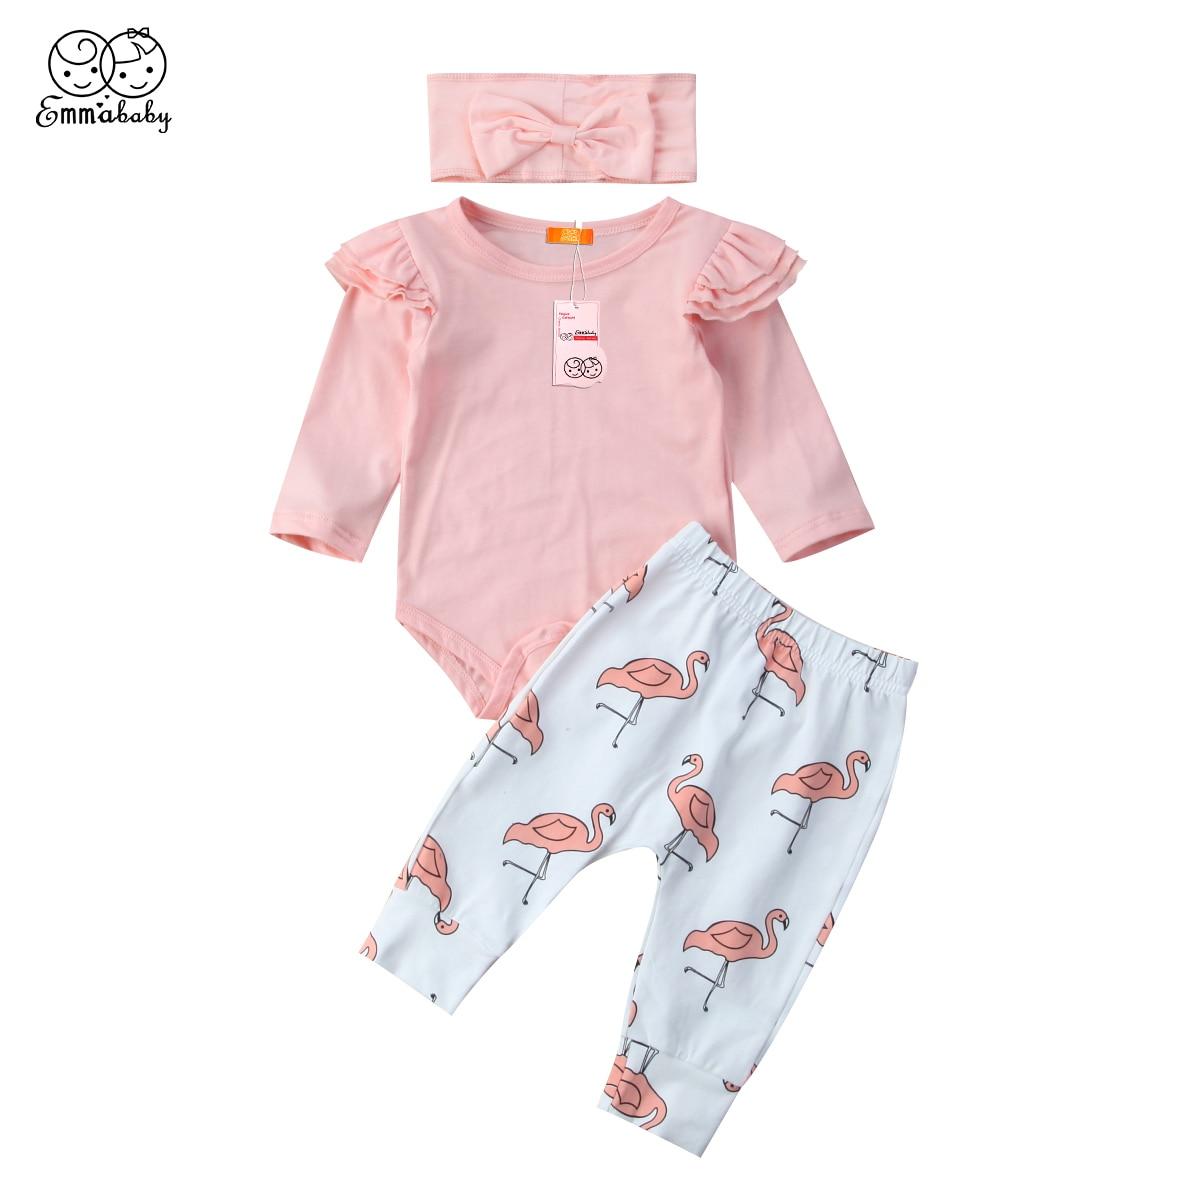 Black Friday Deals 2pcs Lovely Kids Clothes Set Newborn Infant Baby Girls Romper Long Pants Flamingo Clothes Outfits Sets 3PCS